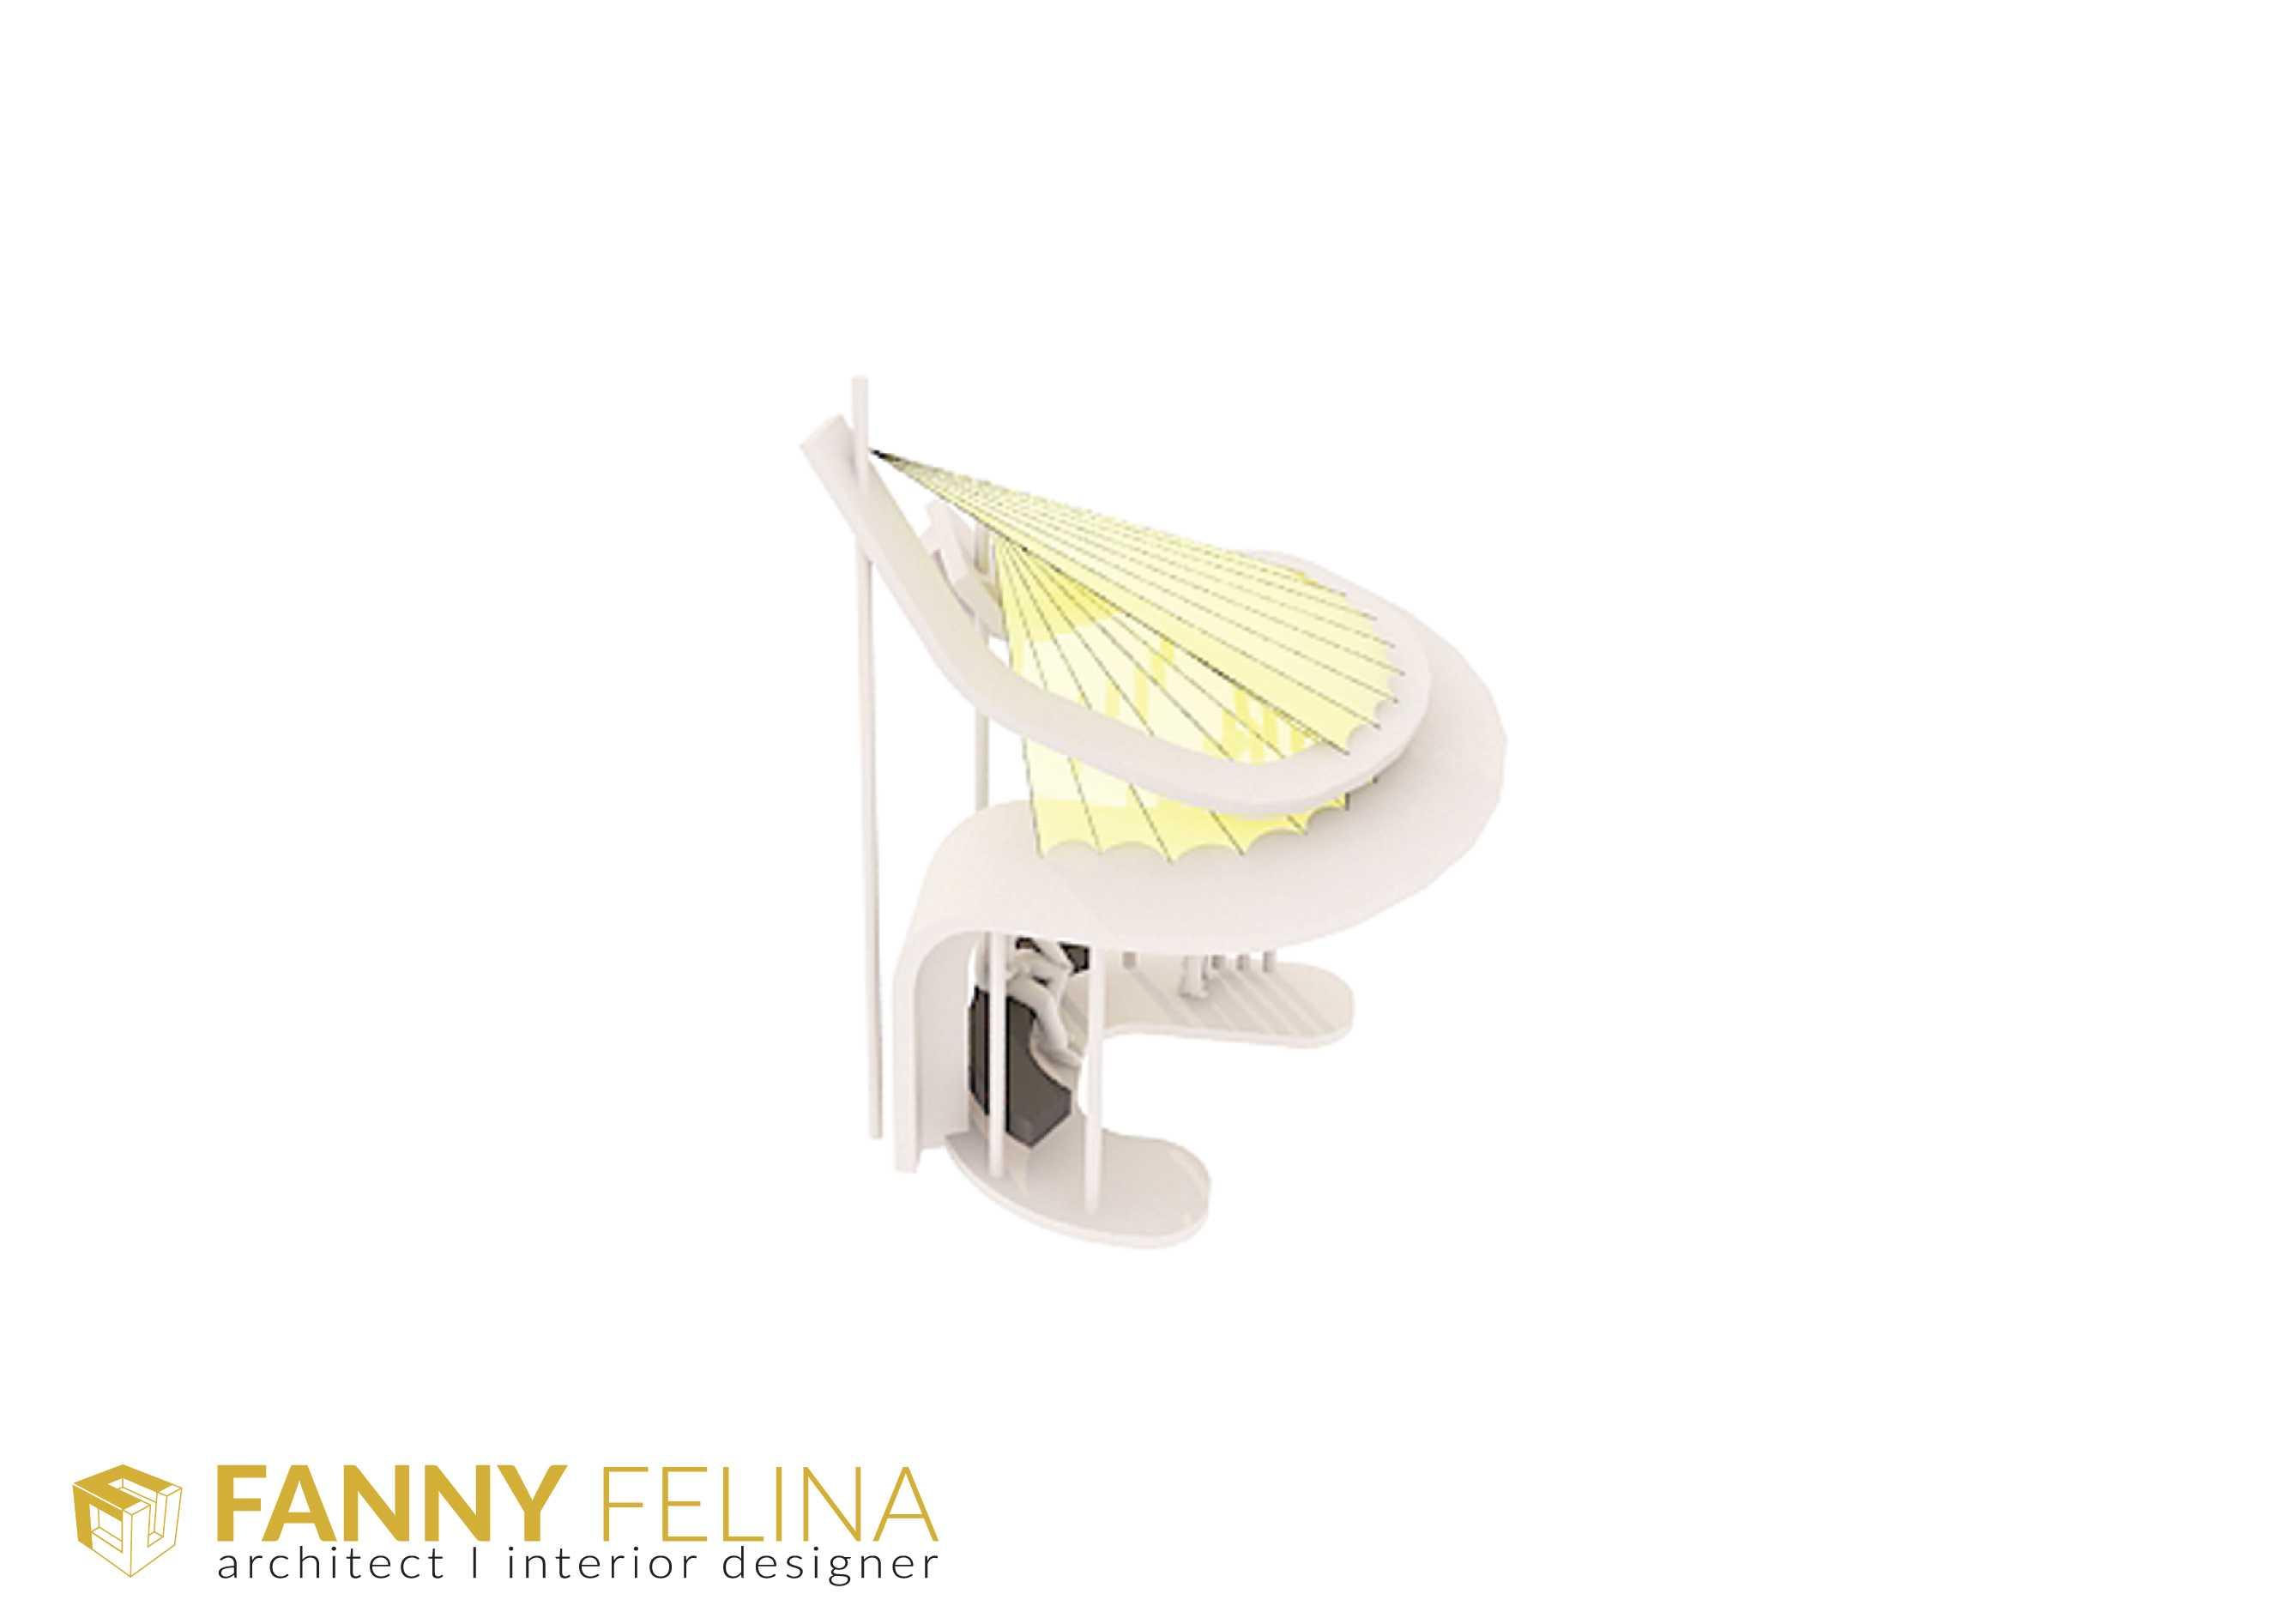 Fanny Felina Architecture & Interior Design P Shelter Surabaya, Surabaya City, East Java, Indonesia Surabaya, Surabaya City, East Java, Indonesia 06 Kontemporer,modern  35314